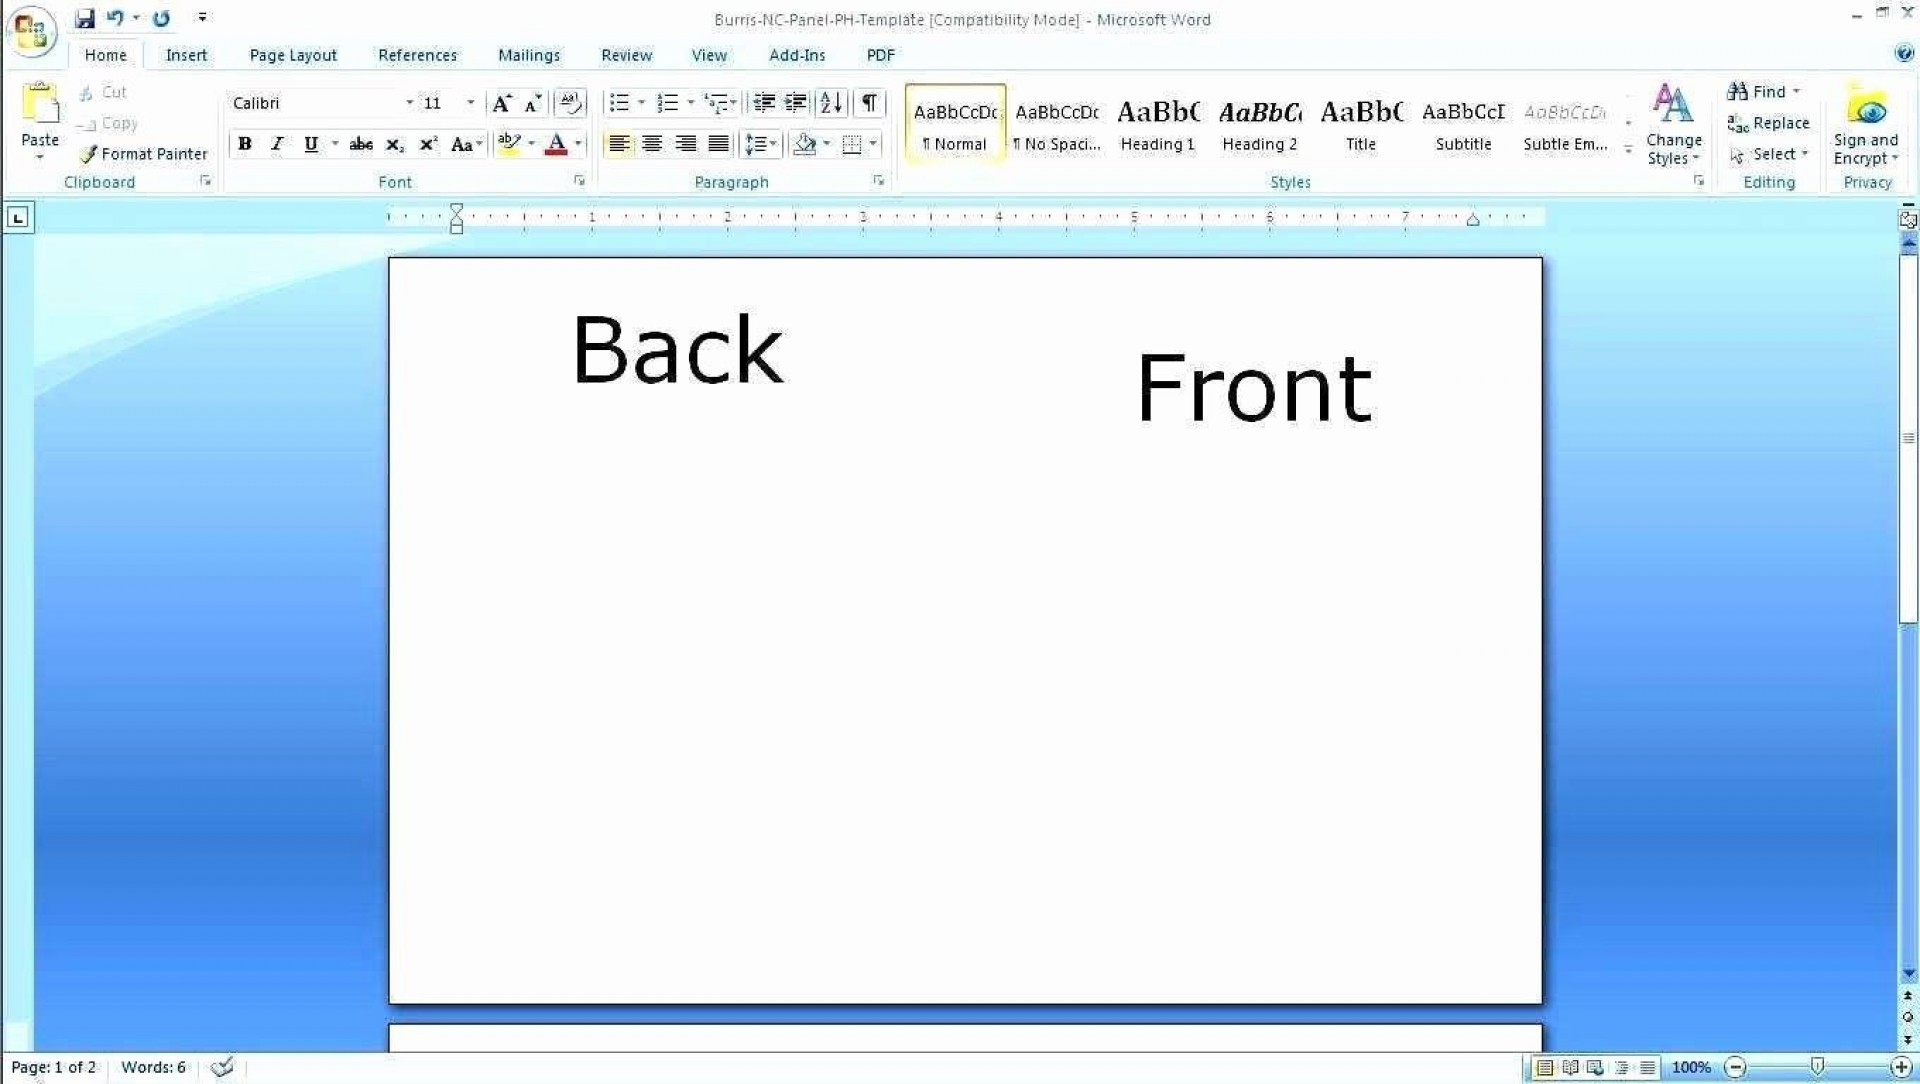 002 Wondrou Busines Card Template Microsoft Word 2010 High Def 1920